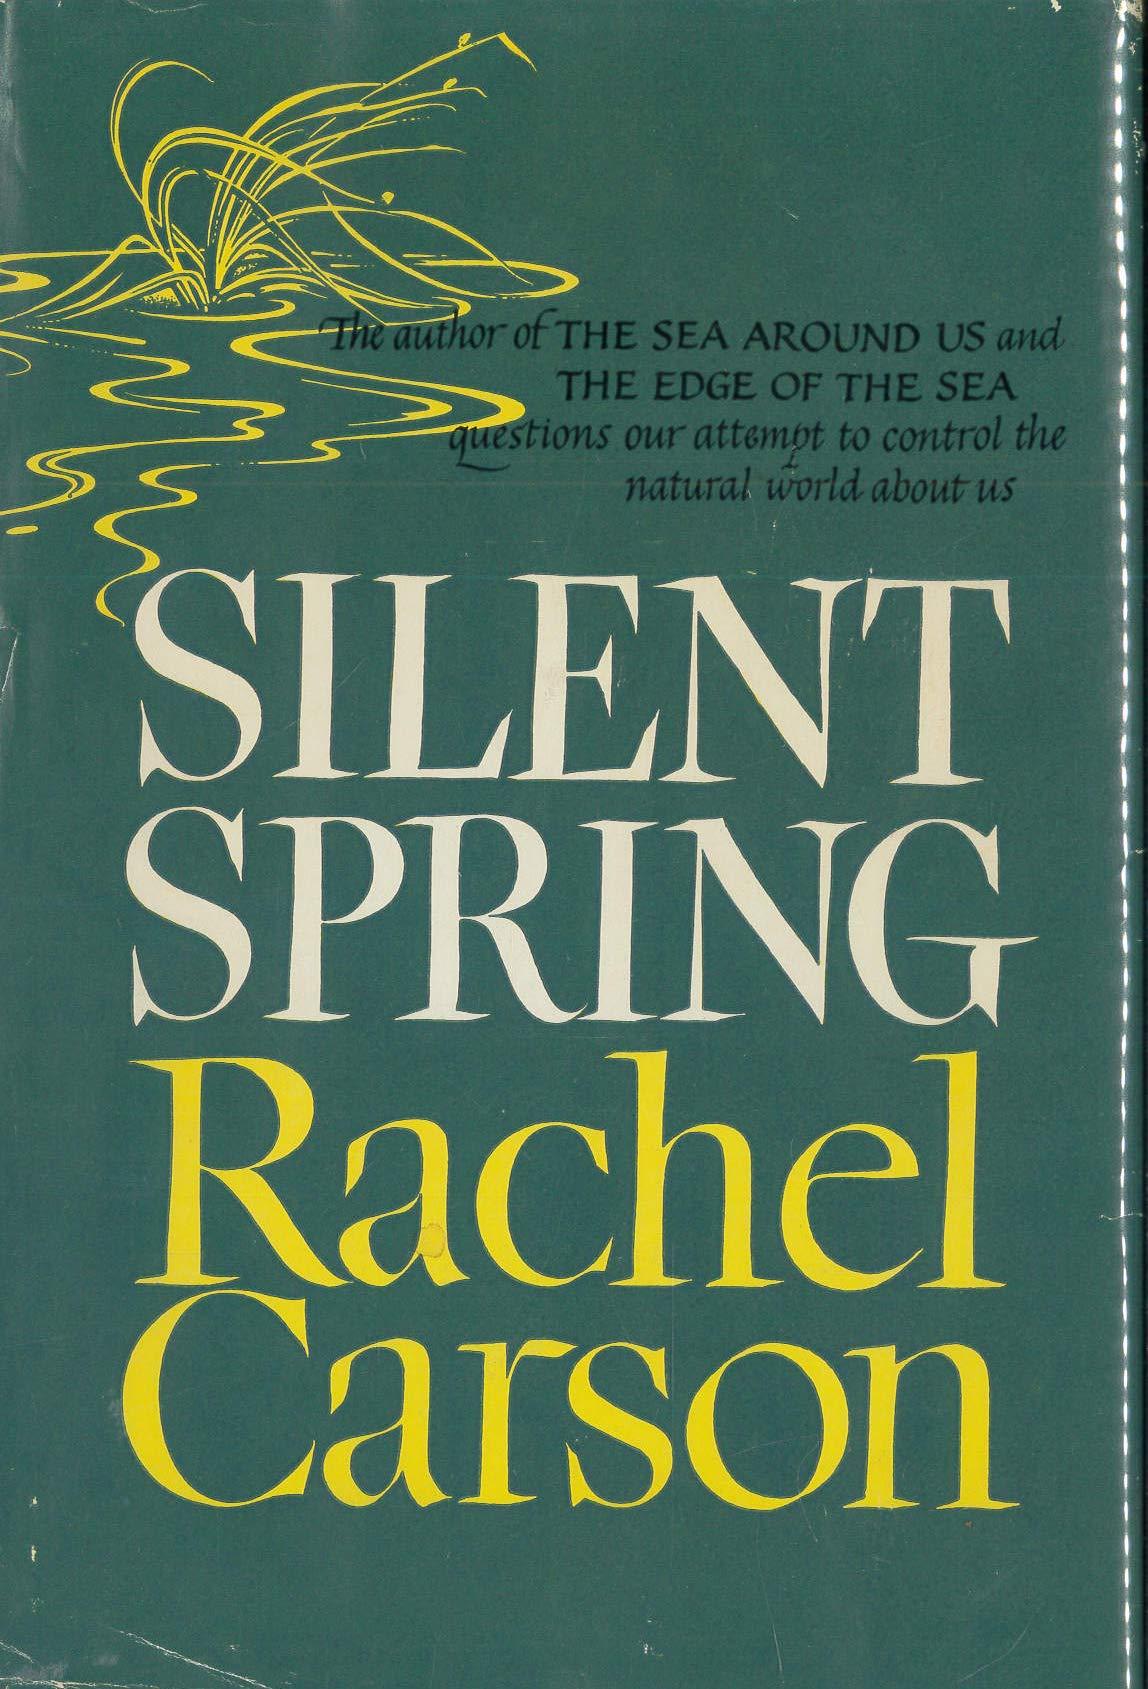 Image result for silent spring rachel carson